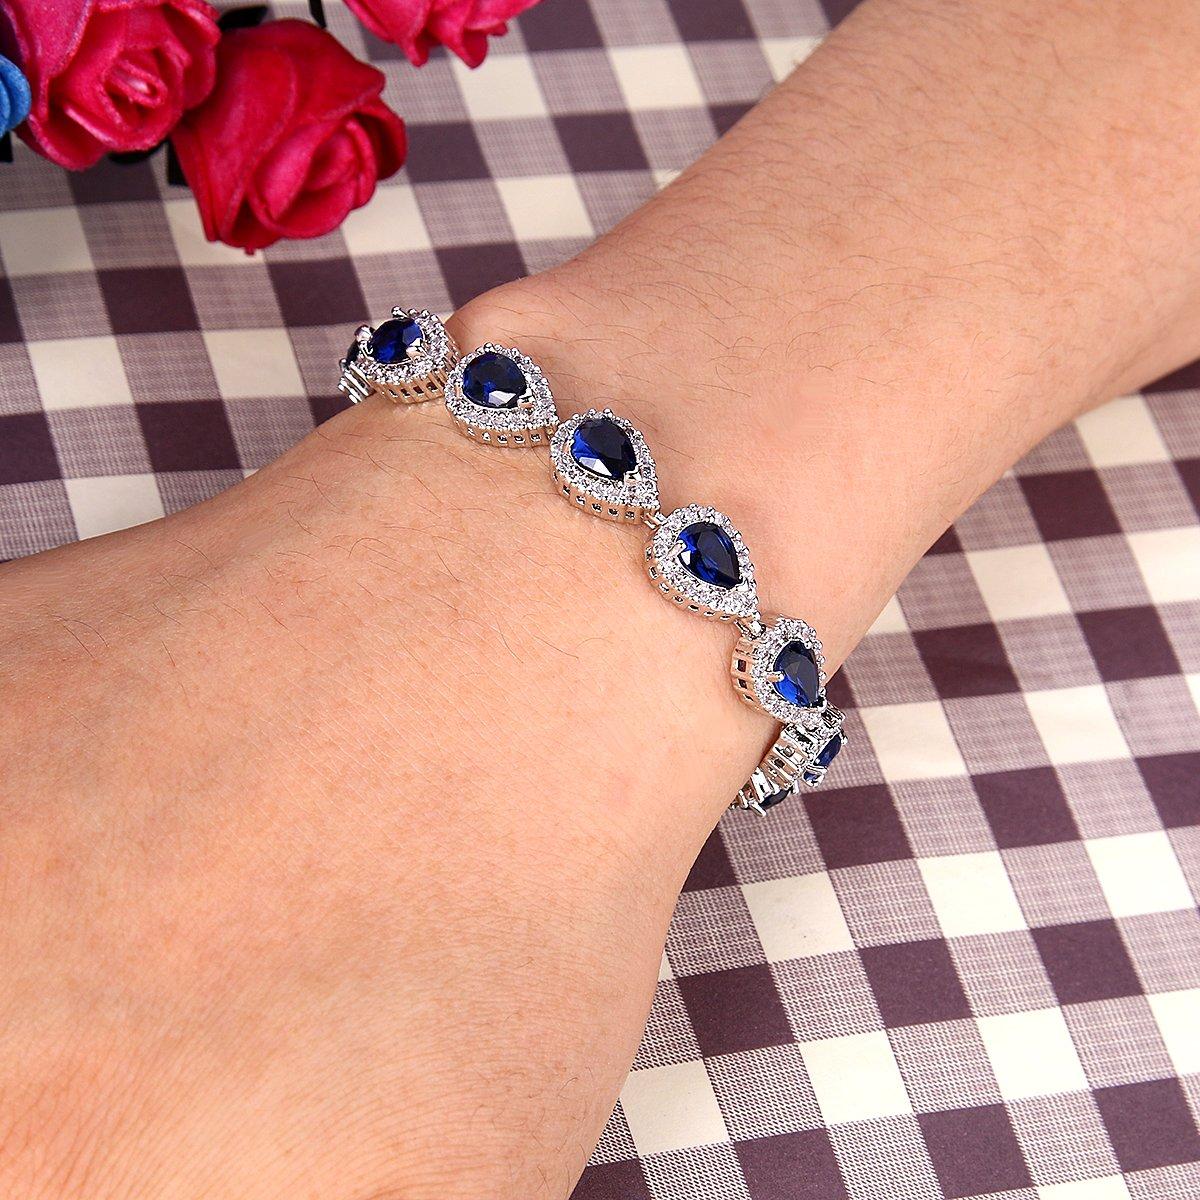 BriLove Women's Wedding Bridal Jewelry Set Y-Necklace Tennis Bracelet Dangle Earrings Set with Teardrop CZ Infinity Figure 8 Sapphire Color Silver-Tone September Birthstone by BriLove (Image #3)